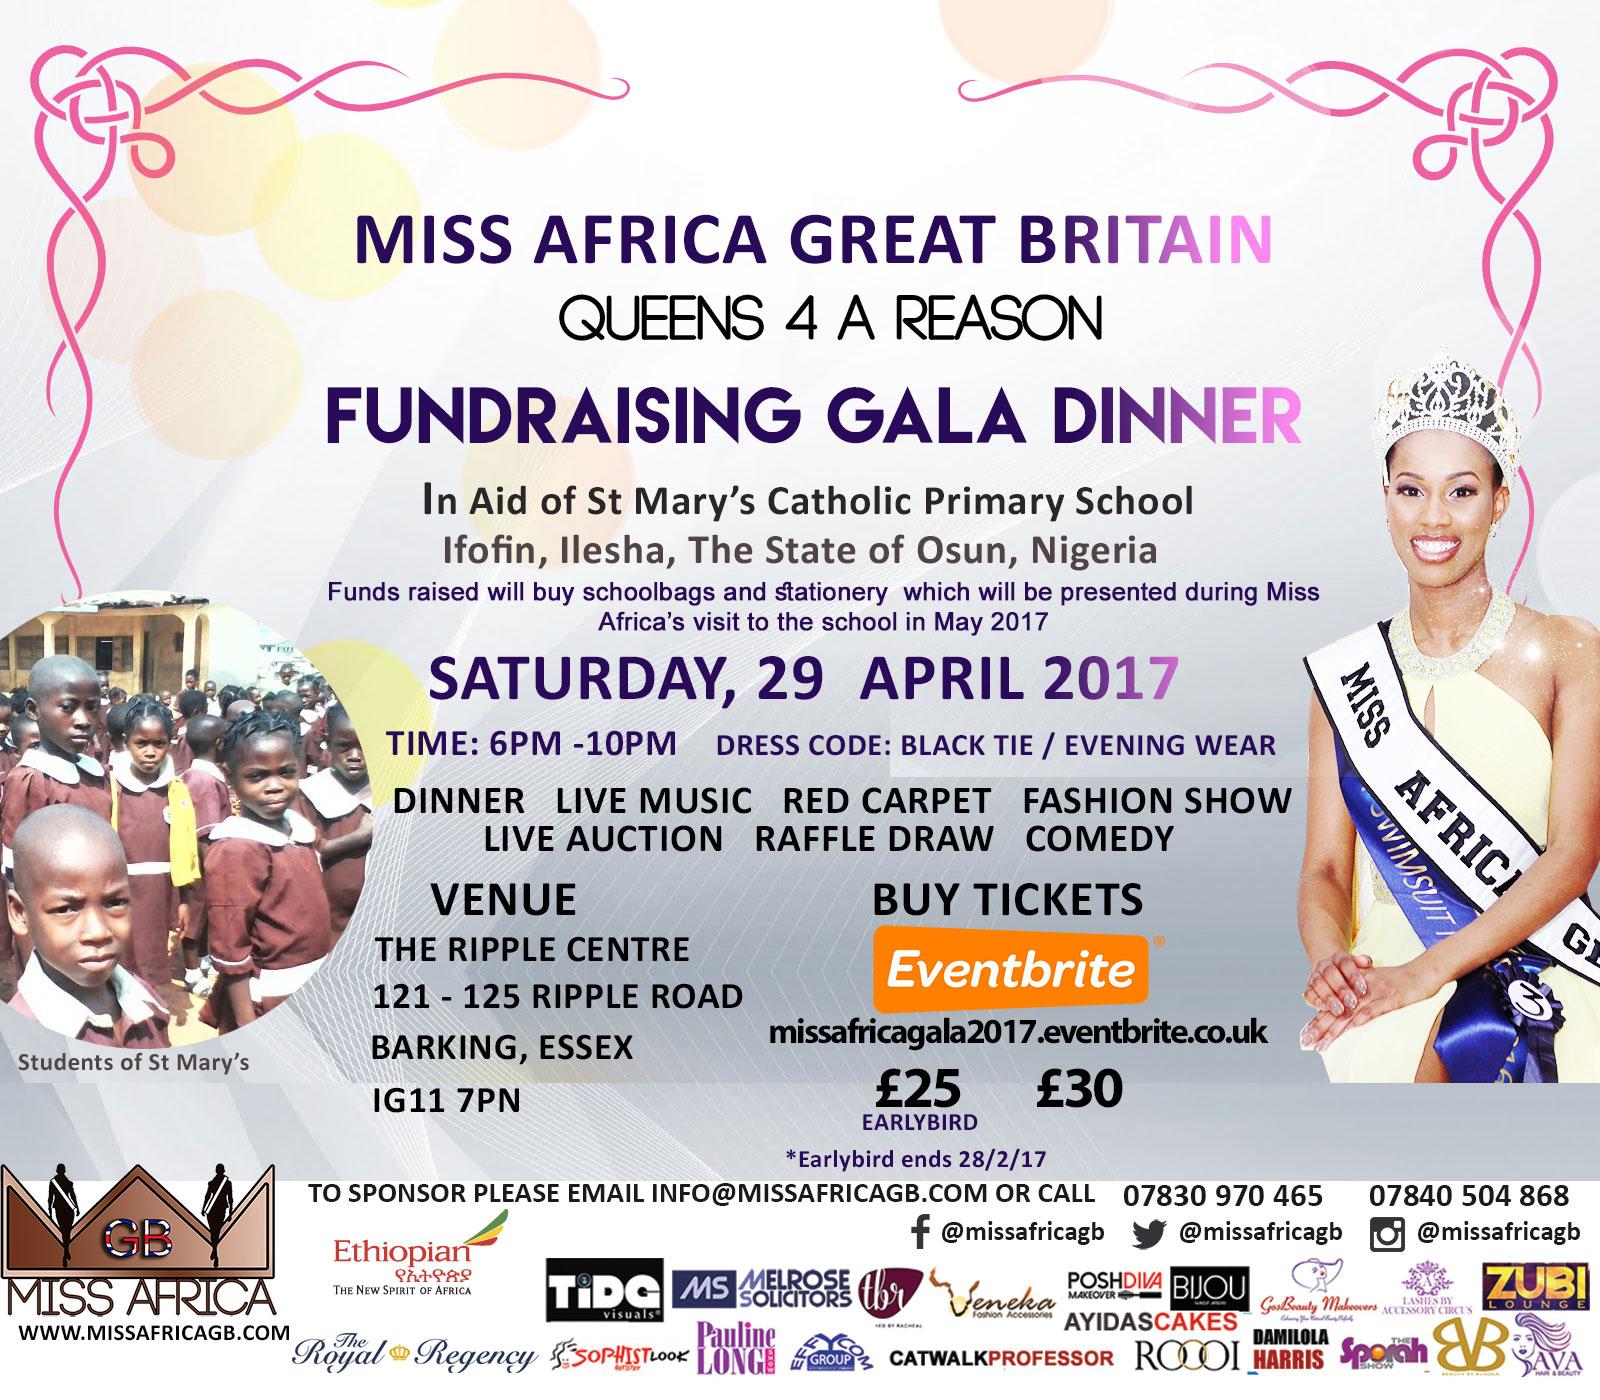 MISS AFRICA GREAT BRITAIN 2017 FUNDRAISER